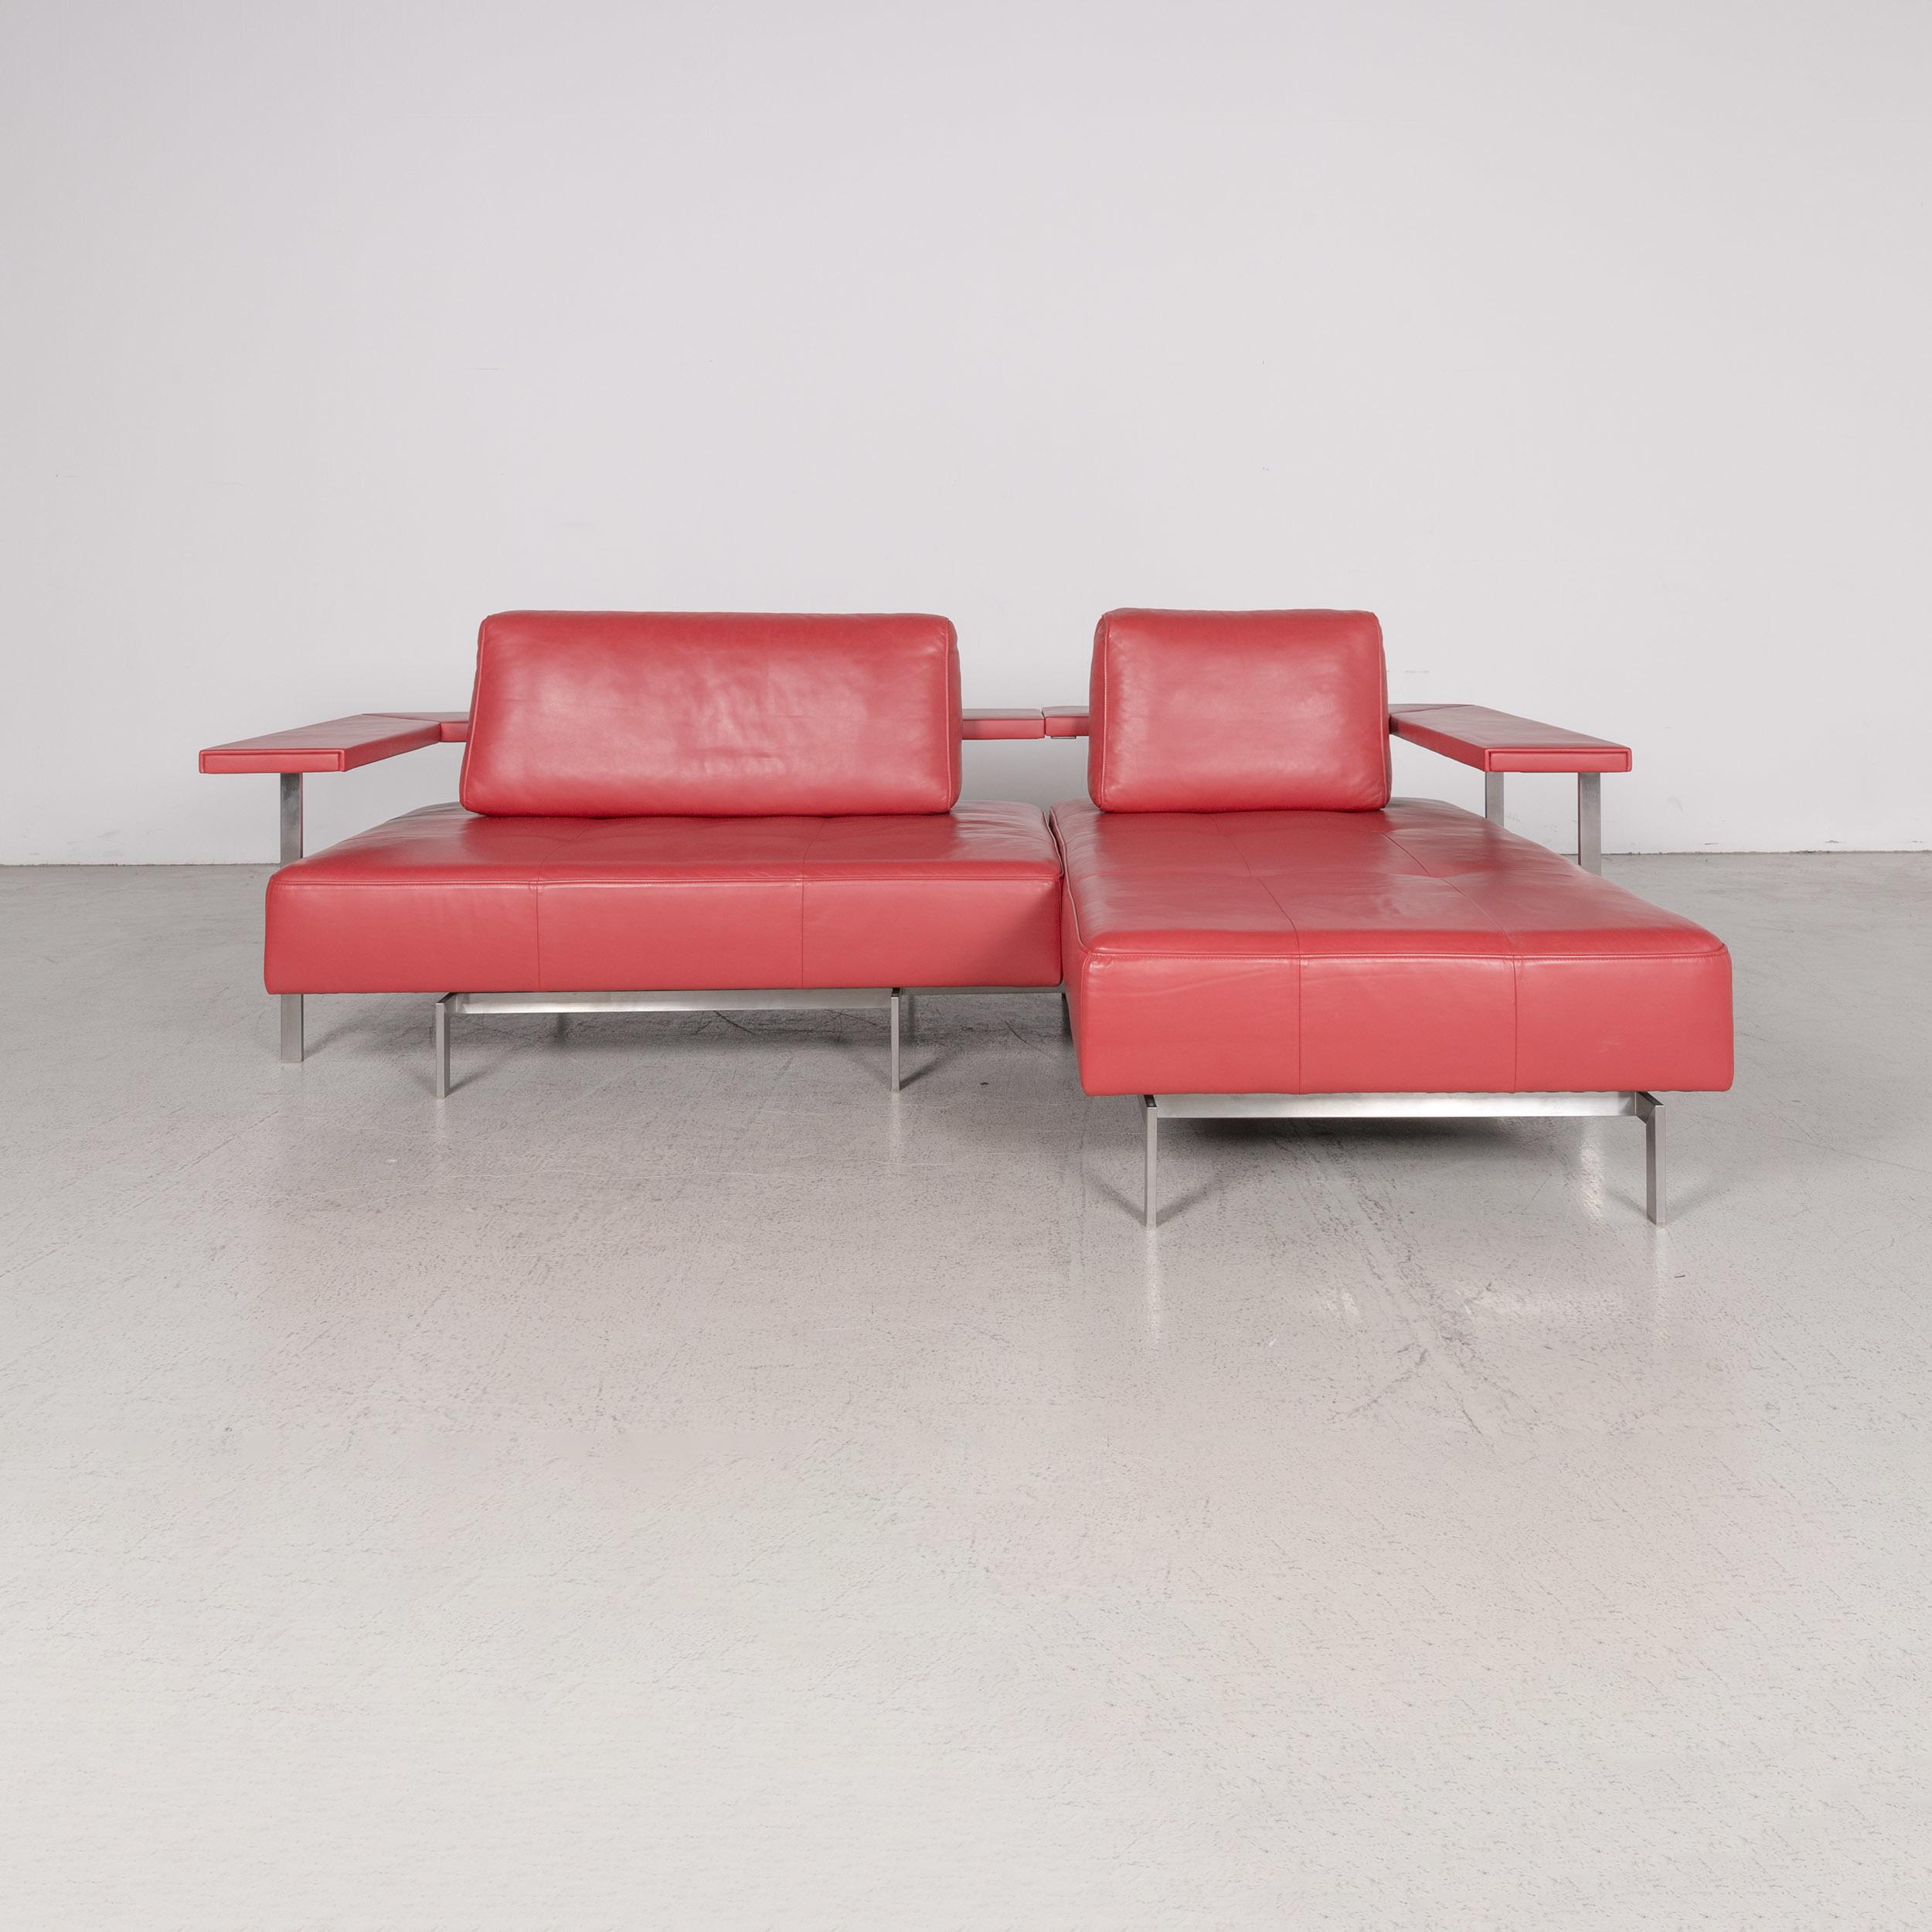 Rolf Benz Dono Designer Leather Sofa Red Corner Sofa Genuine Leather ...